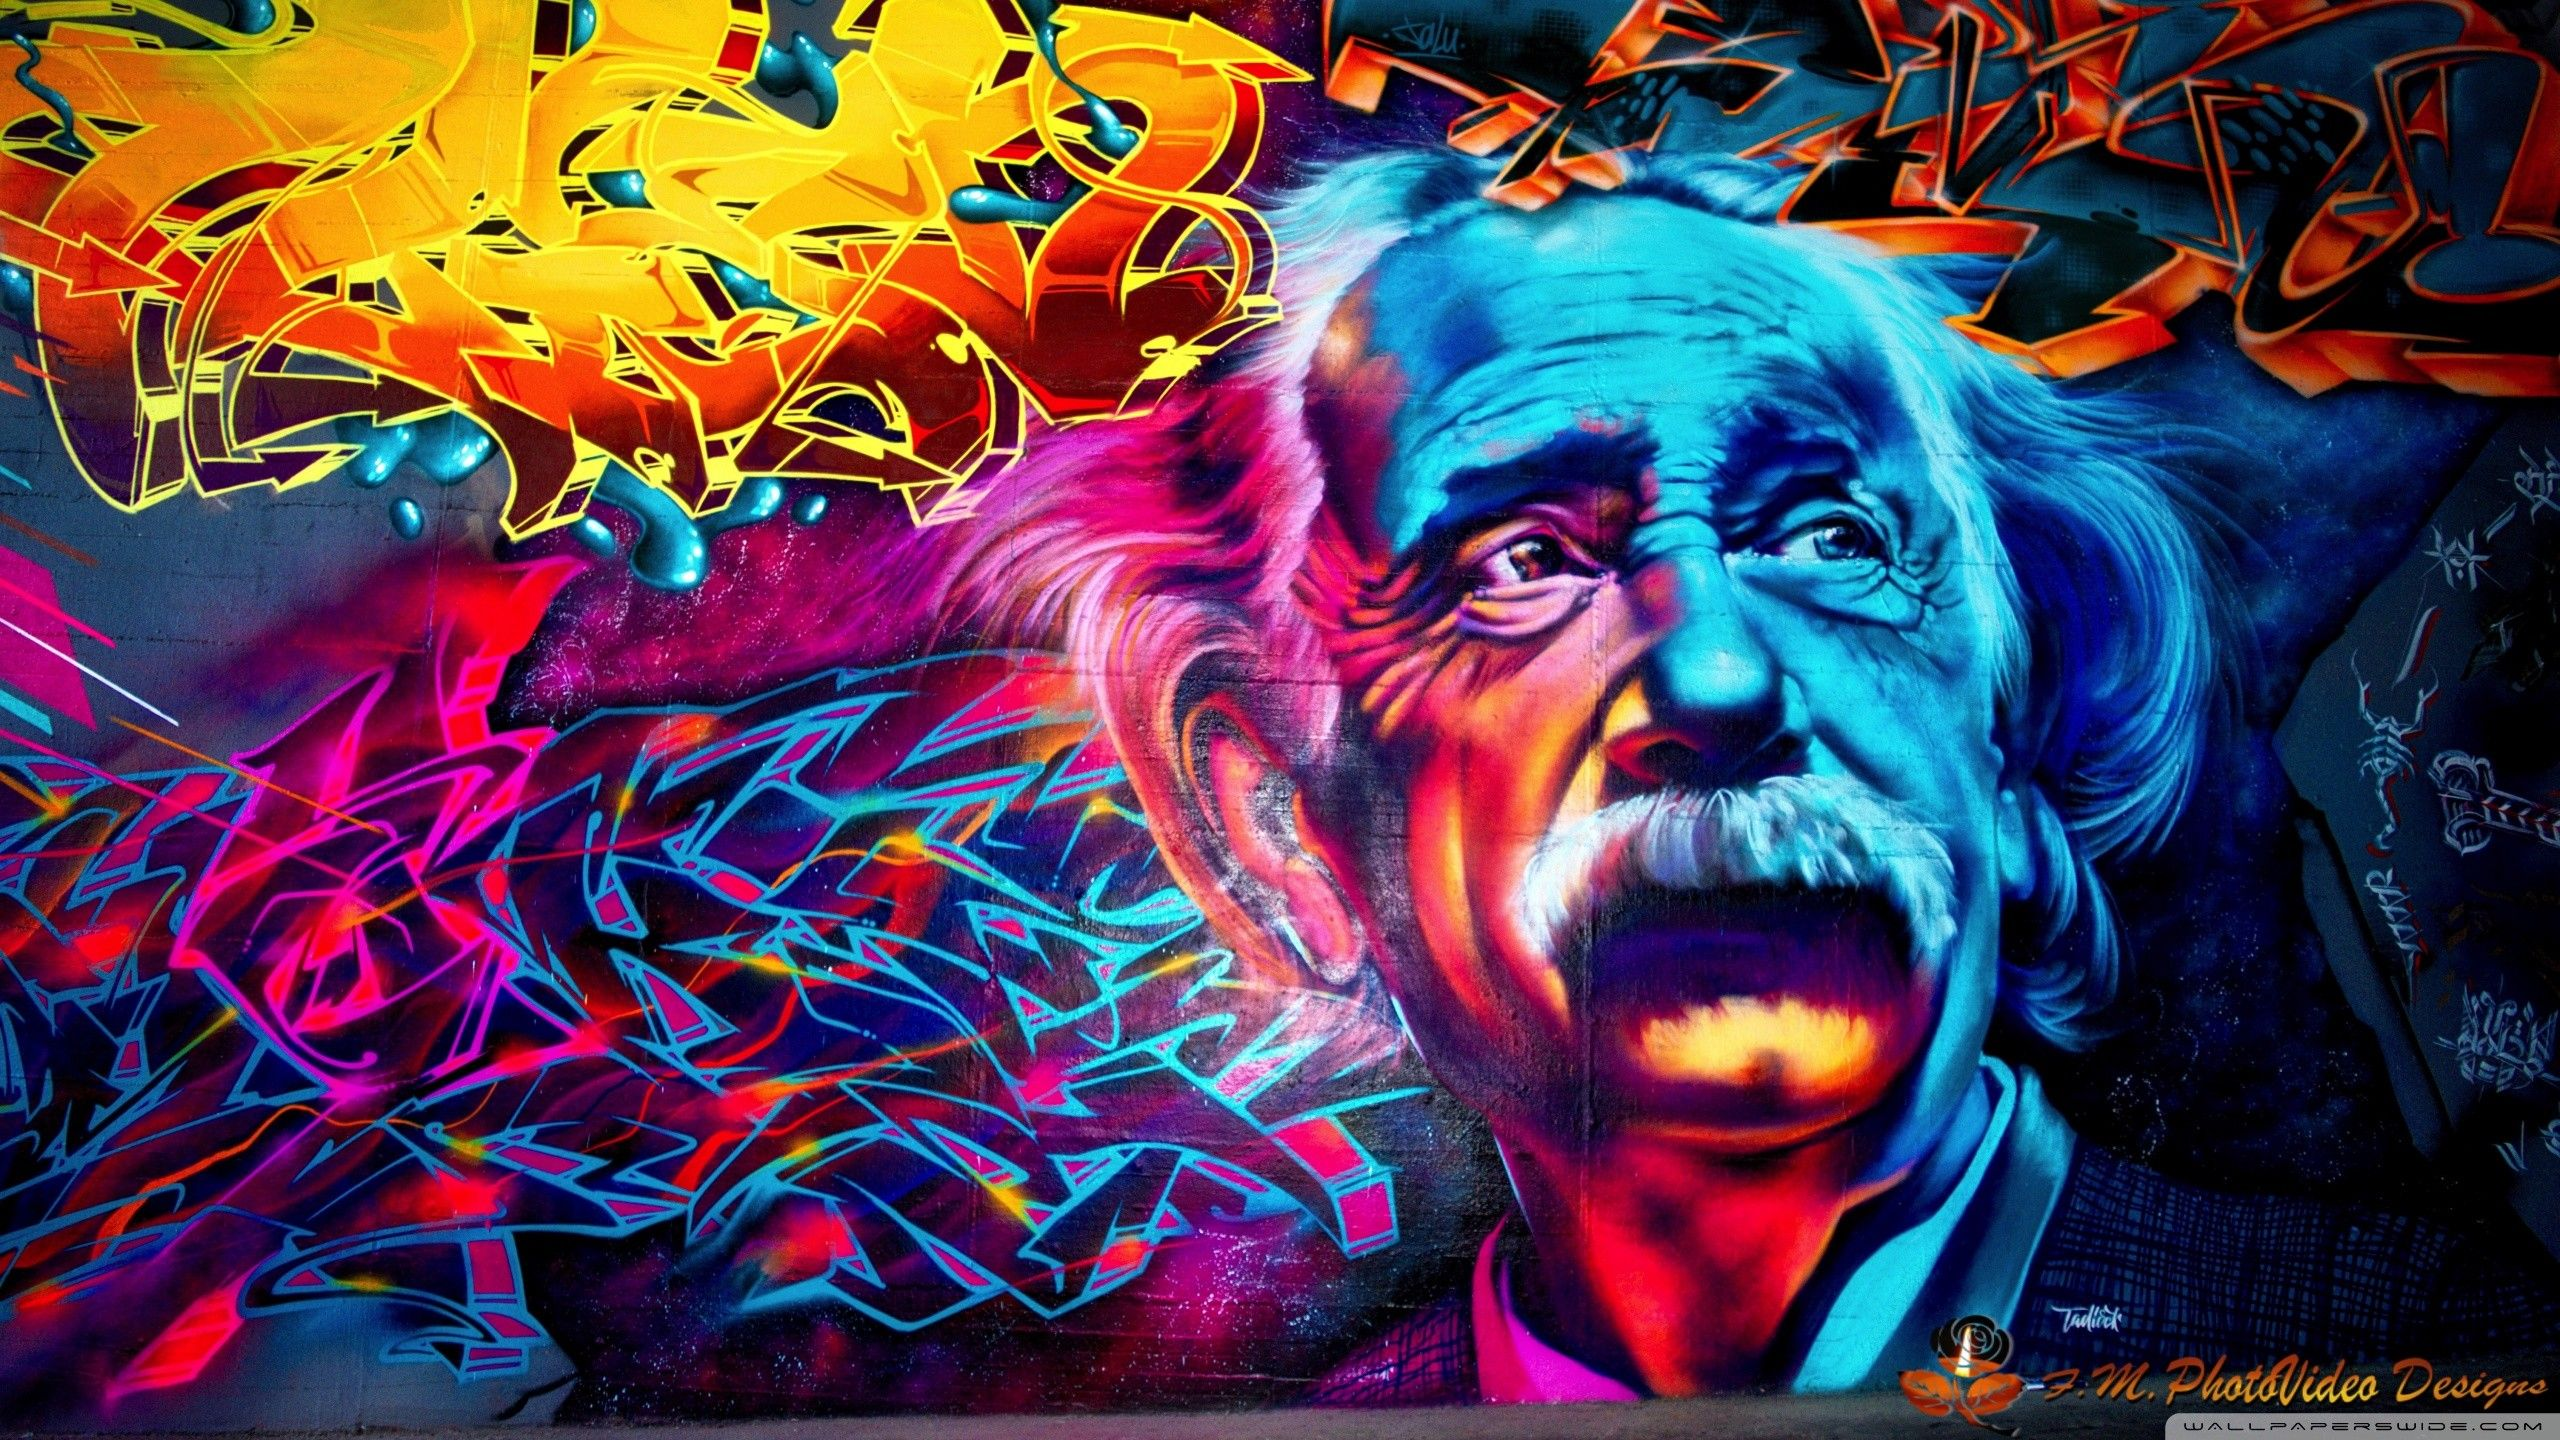 Uhd Art Wallpapers Top Free Uhd Art Backgrounds Wallpaperaccess